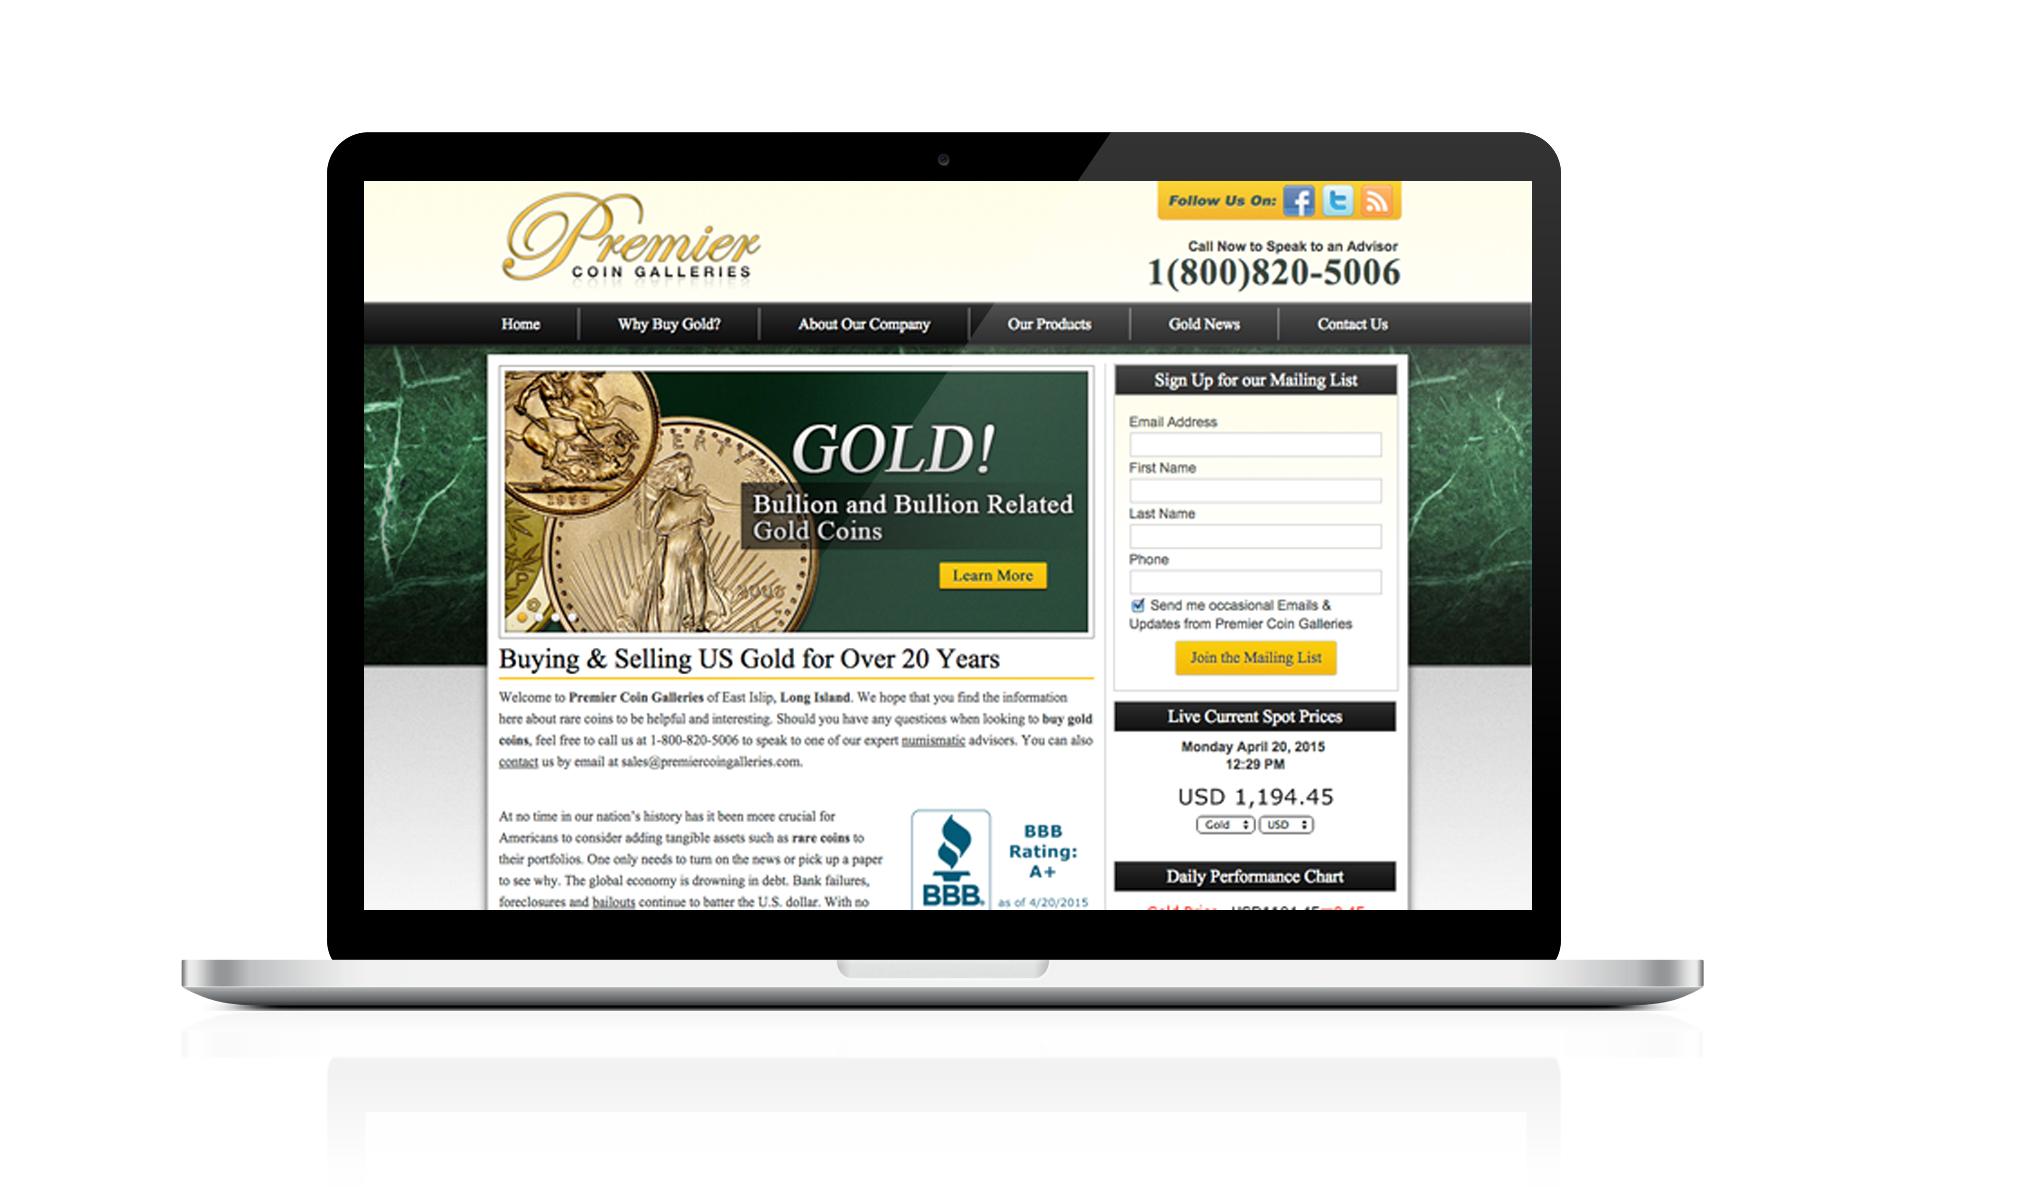 https://www.logicwebmedia.com/wp-content/uploads/premier-coin-galleries-laptop.jpg